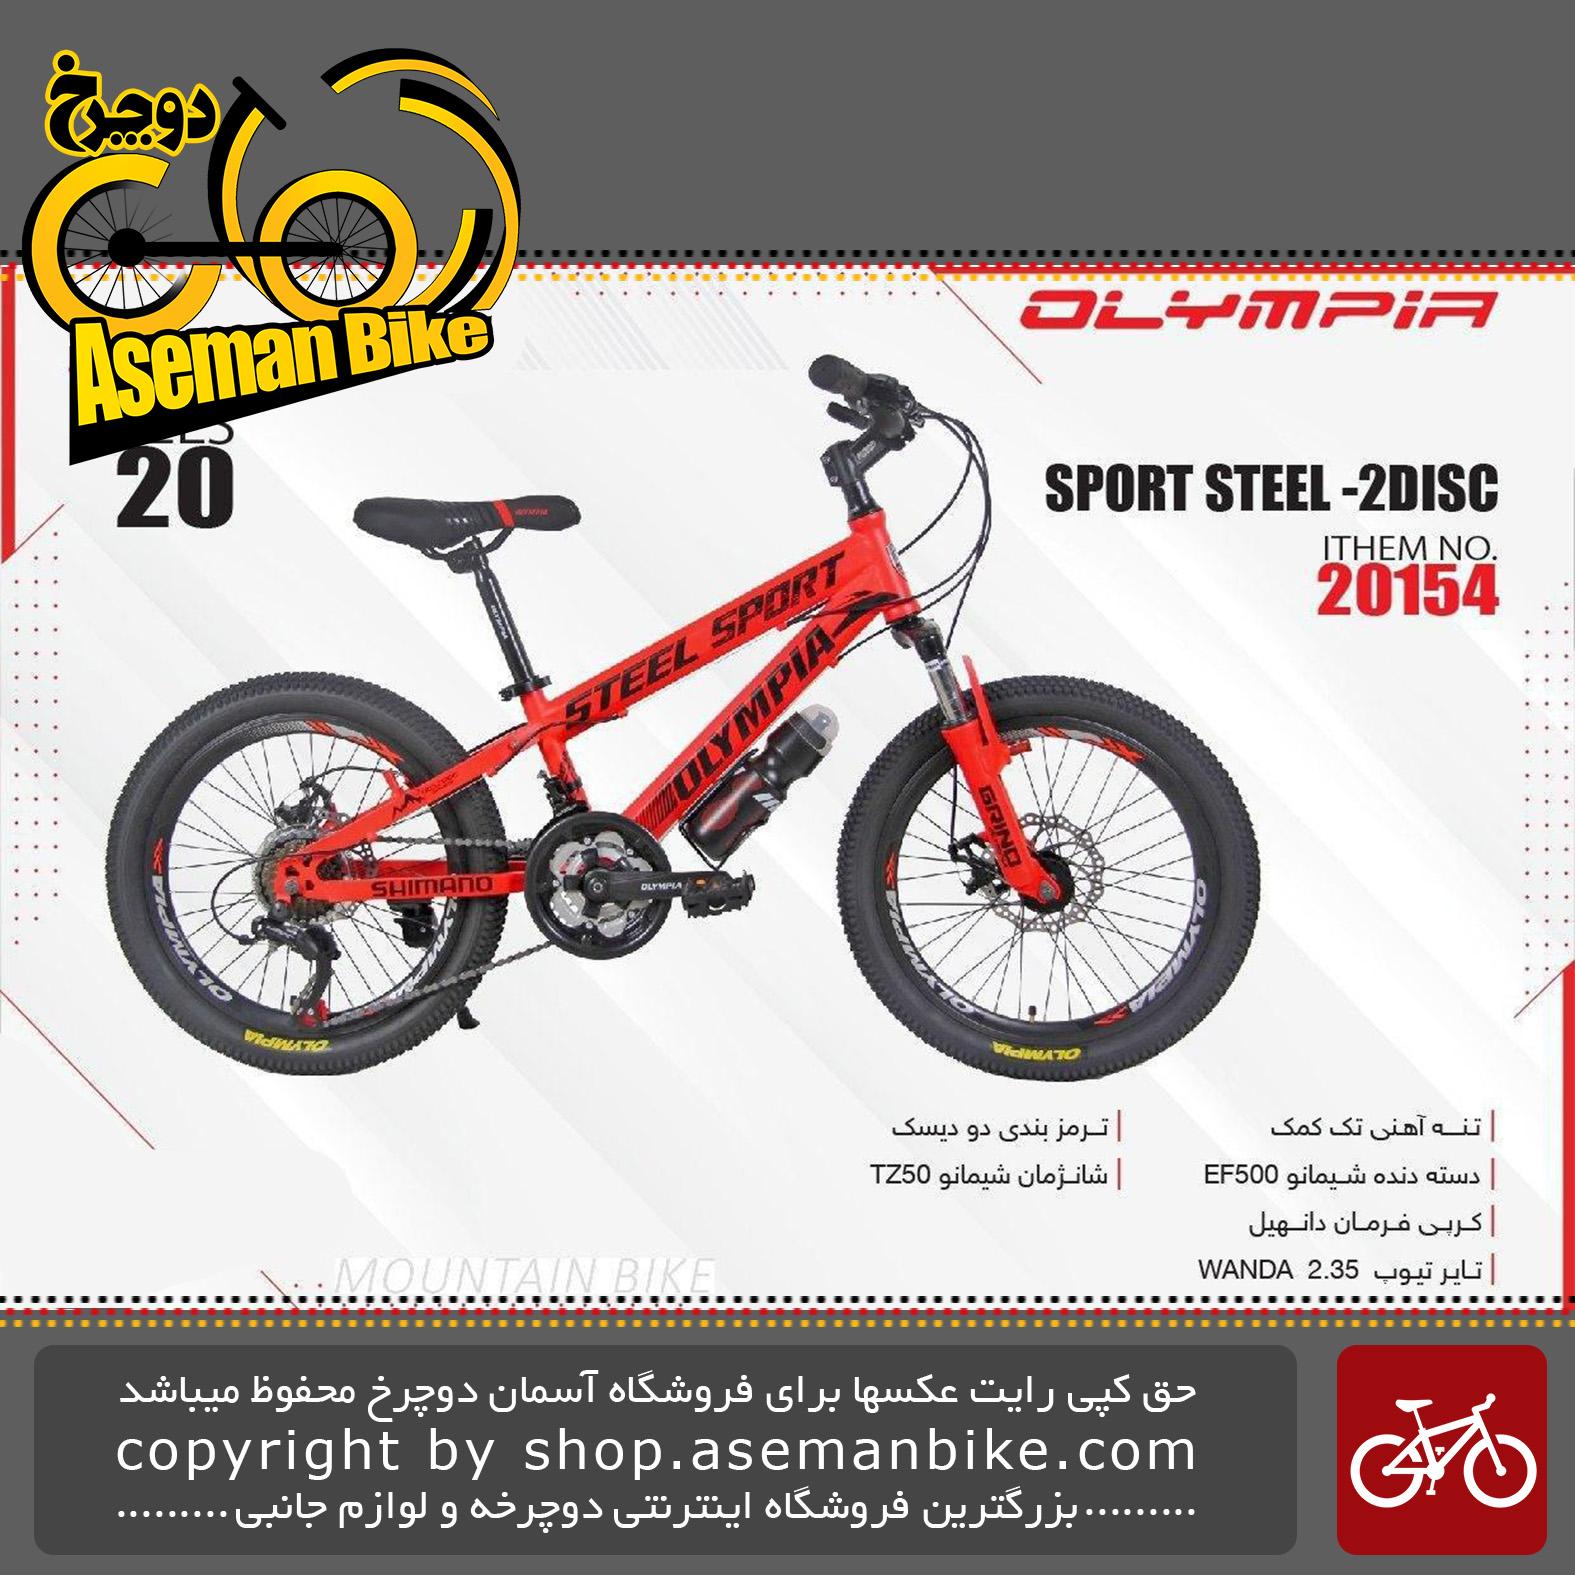 دوچرخه کوهستان شهری المپیا سایز 20 مدل اسپرت استیل 2 دیسک OLYMPIA Bicycle Size 20 Model SPORT STEEL 2 Disc